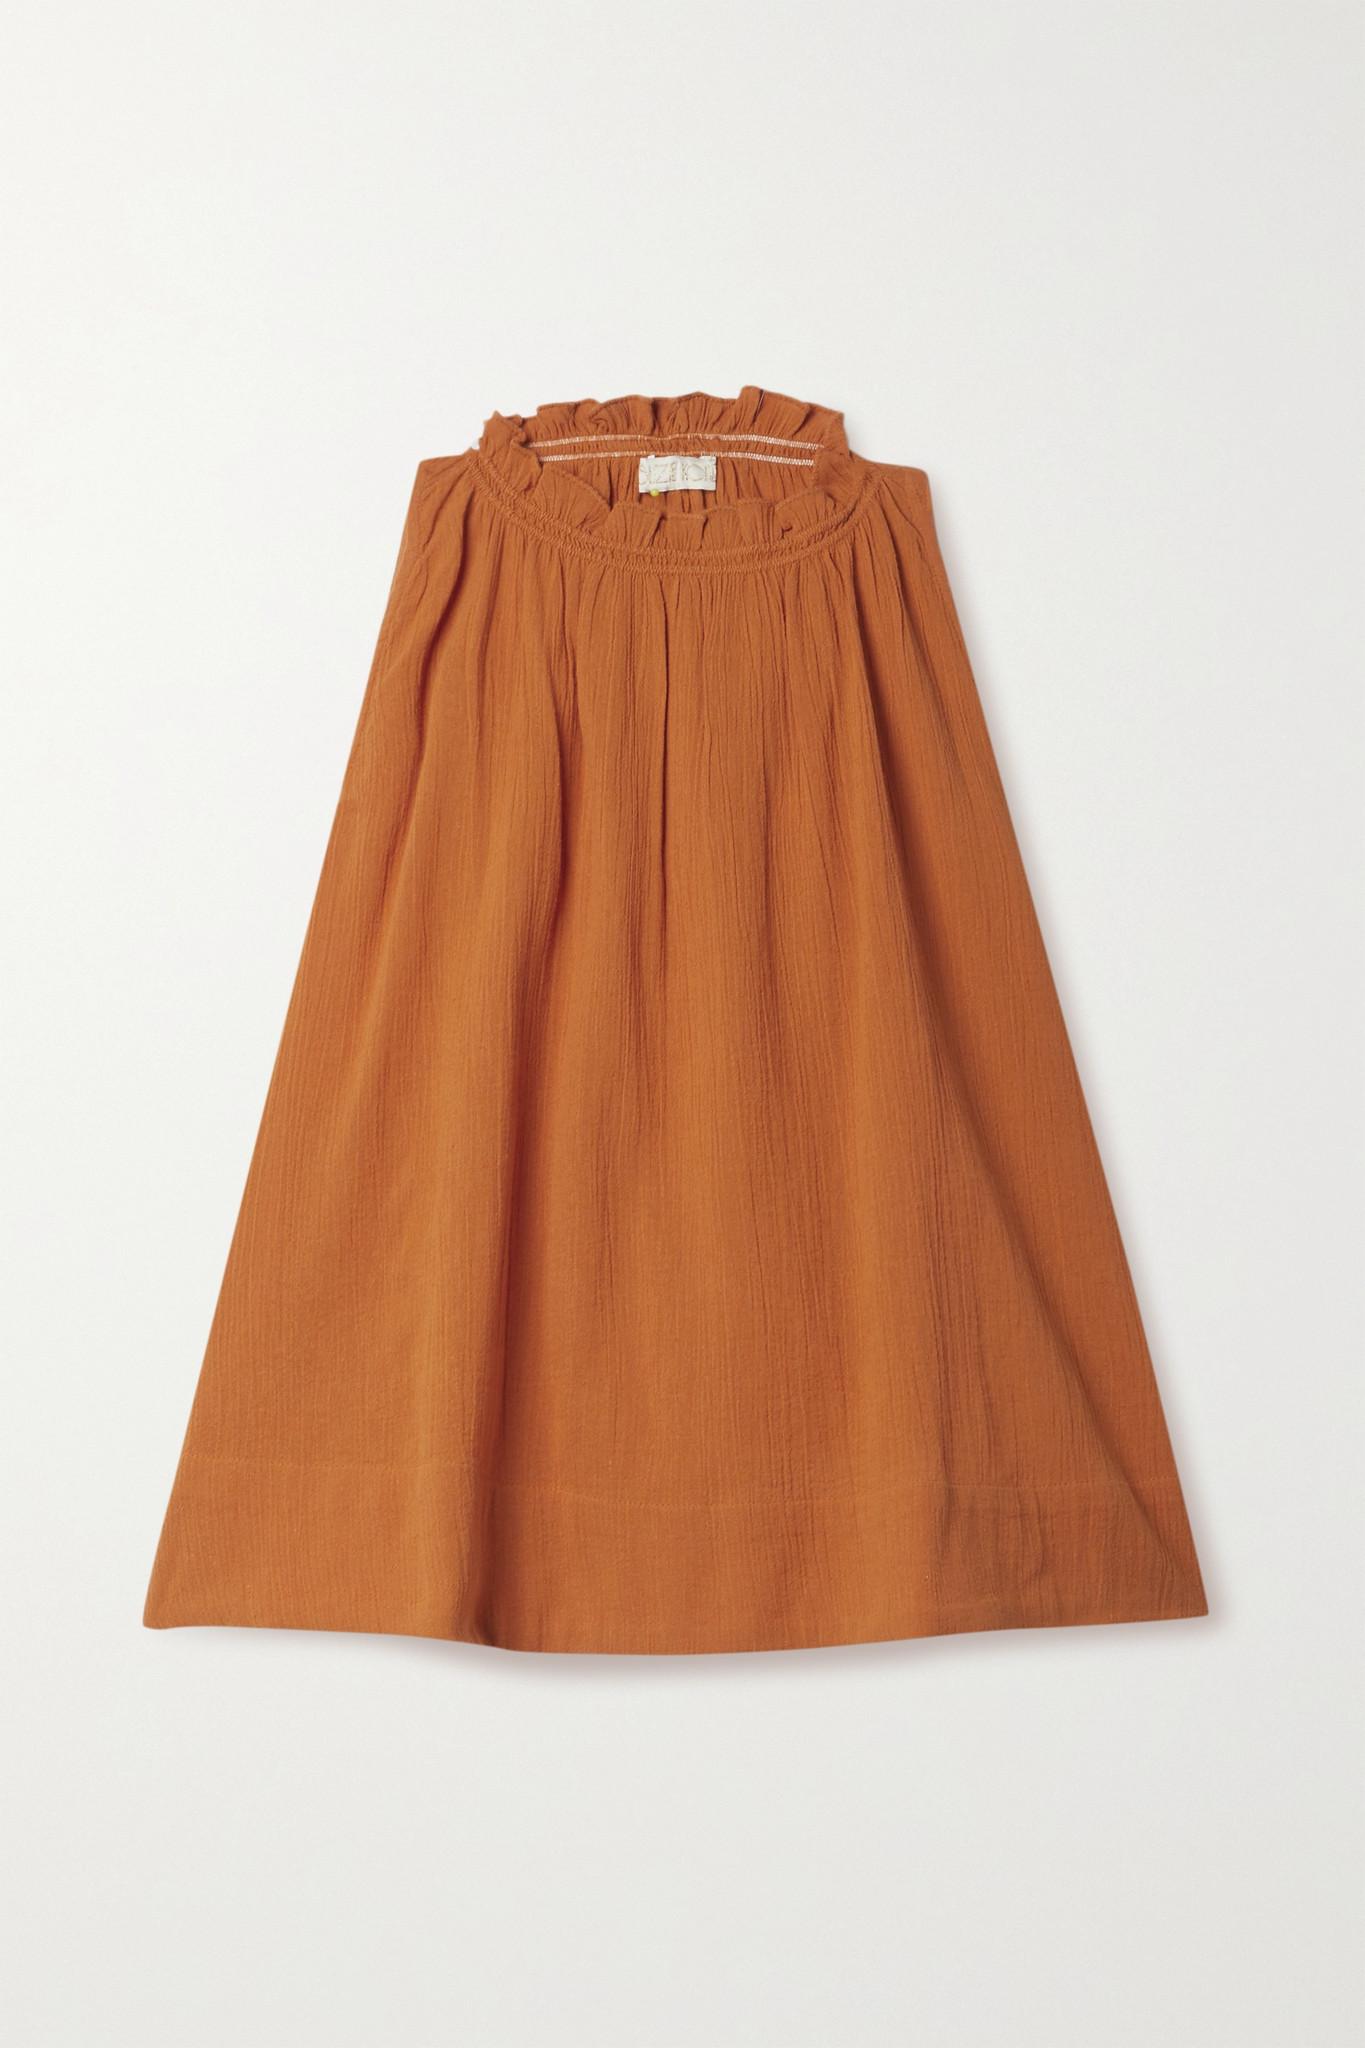 SUZIE KONDI - Ruffled Cotton-gauze Top - Orange - x small